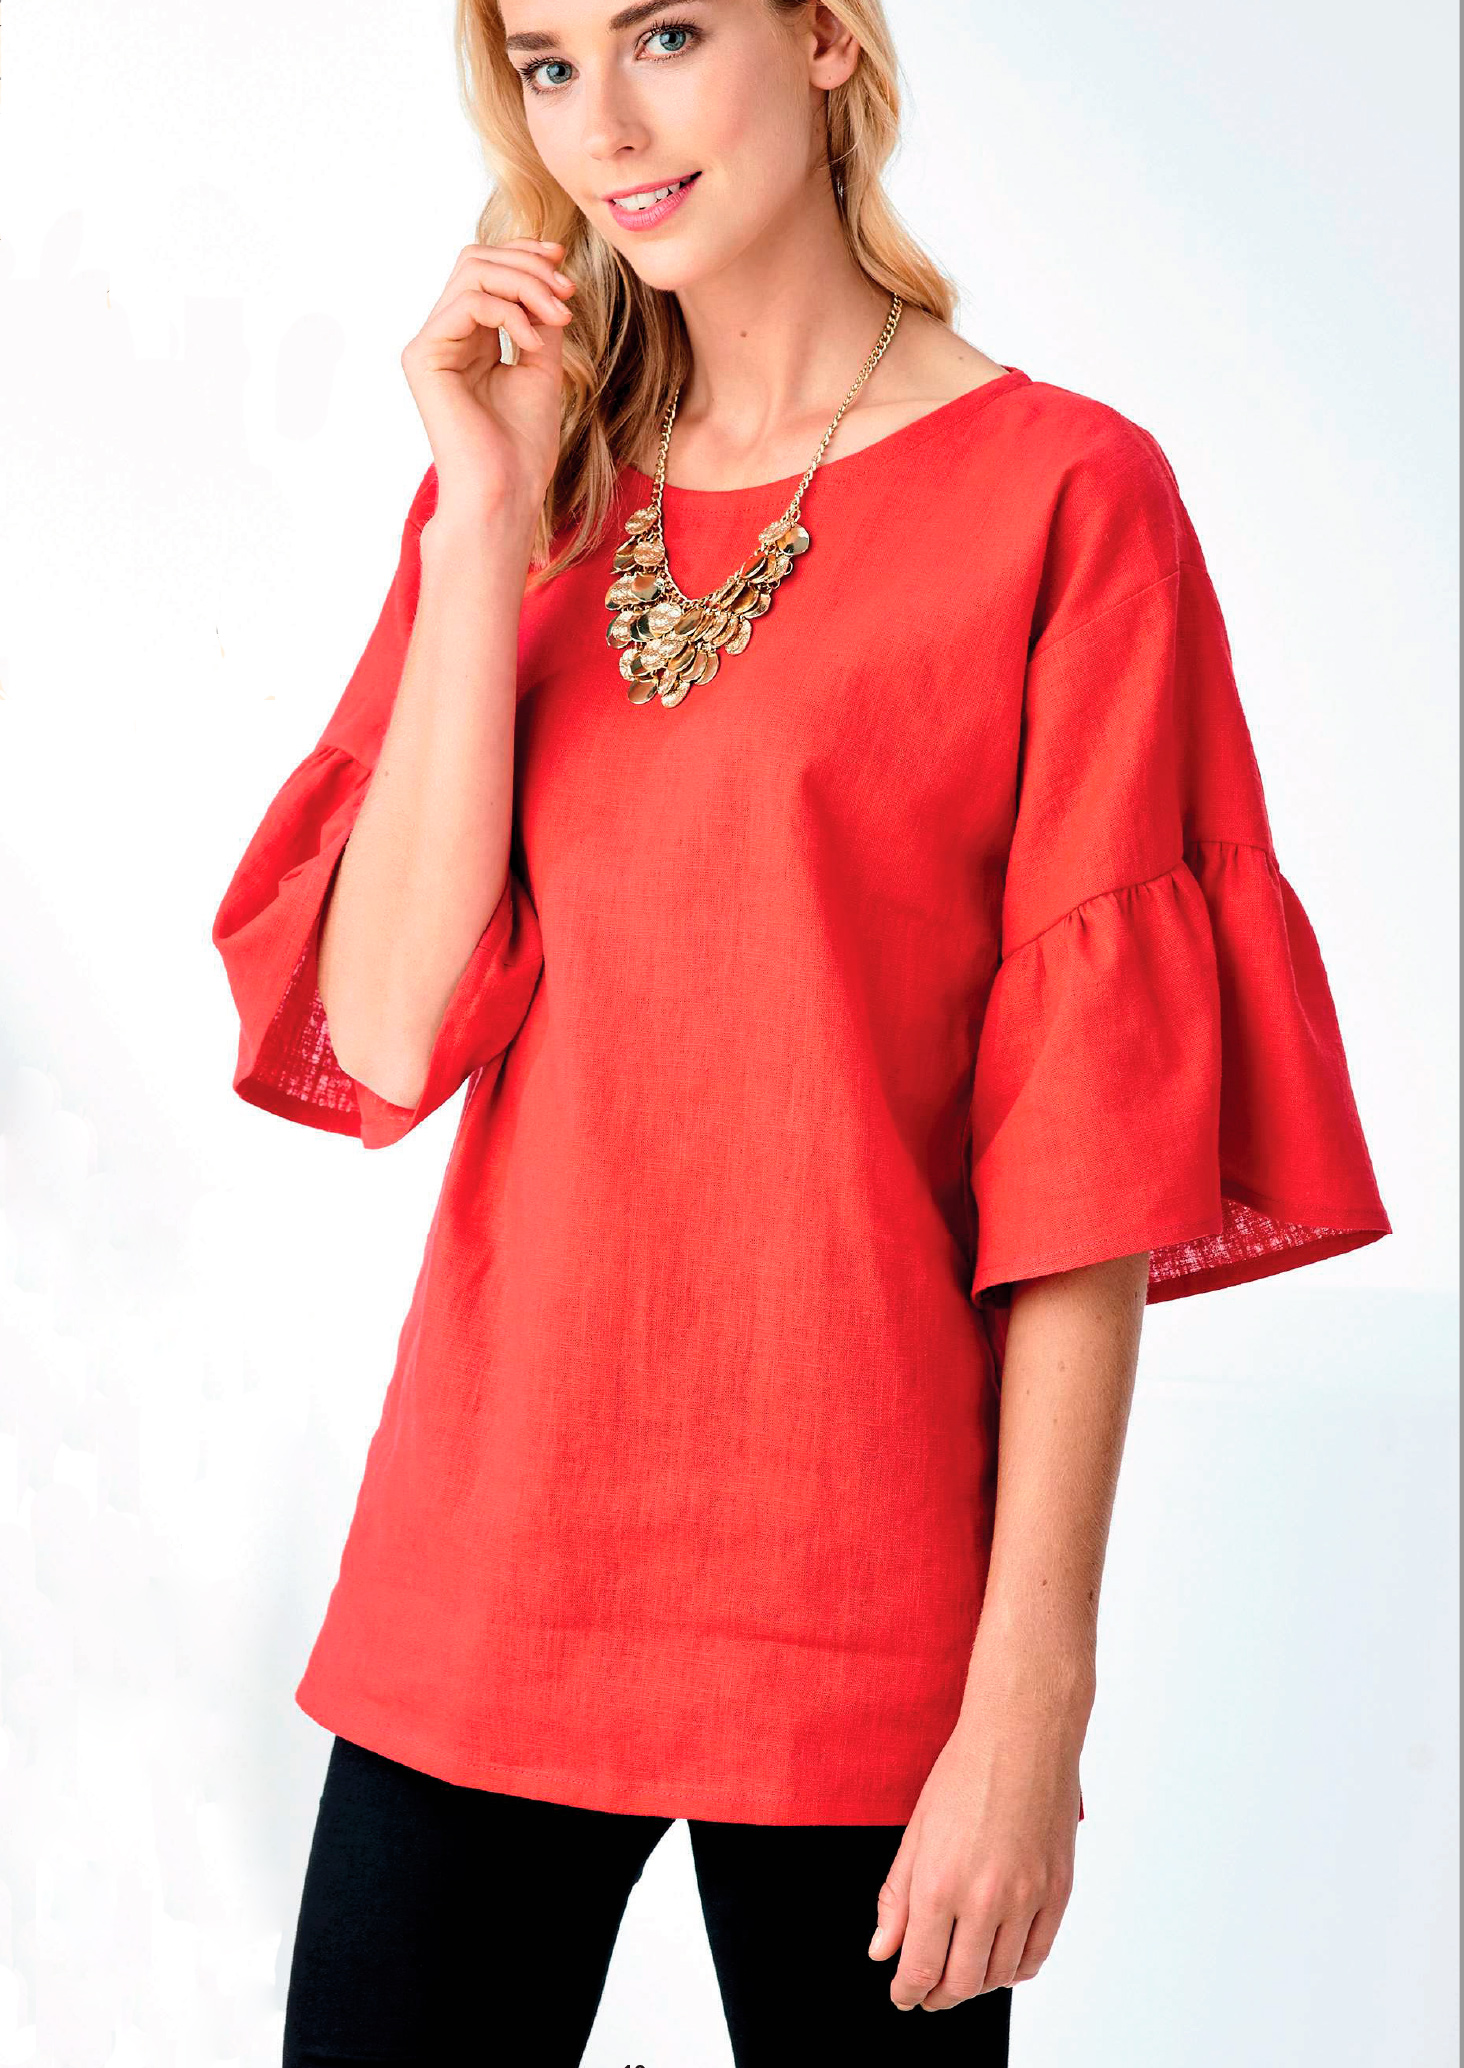 Арабэлла; блузка своими руками из 1 метра ткани